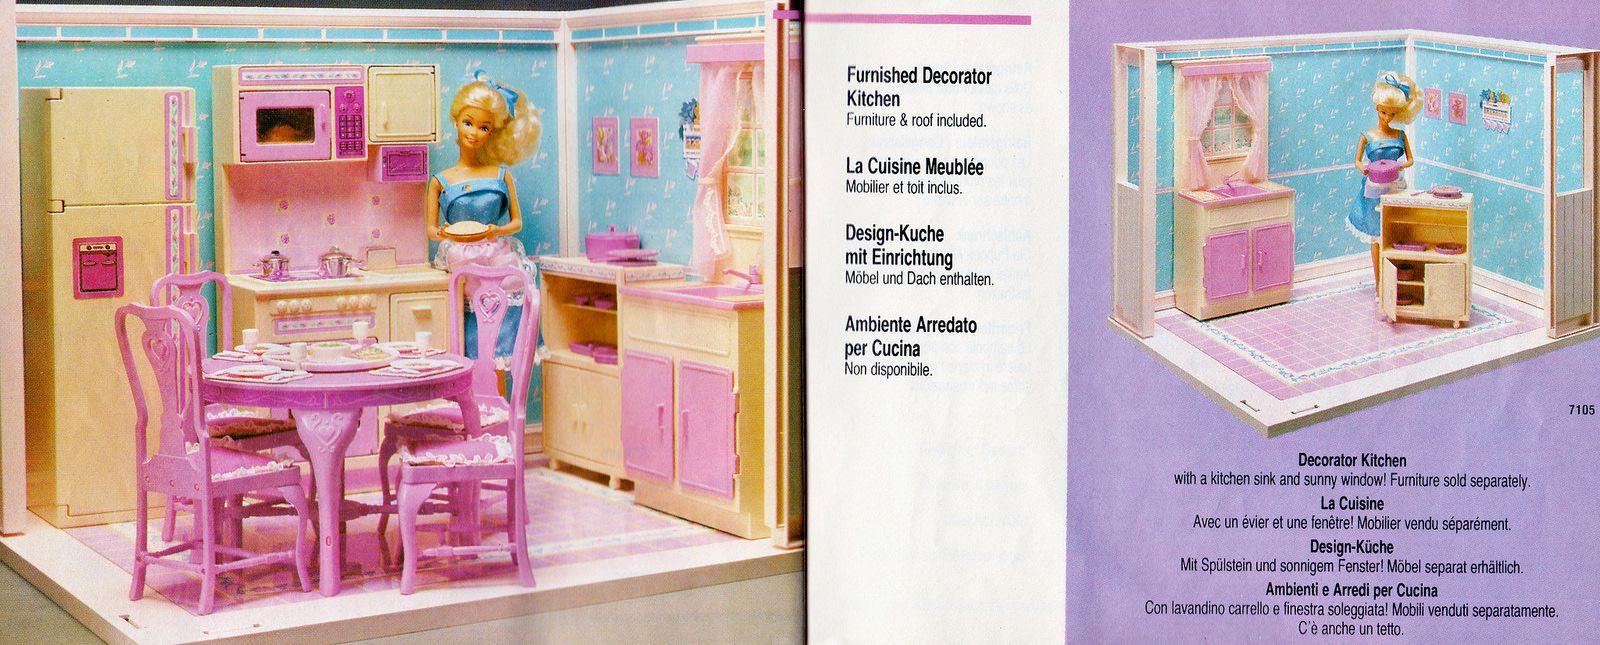 1987 Living Pretty Barbie Furnished Decorator Kitchen